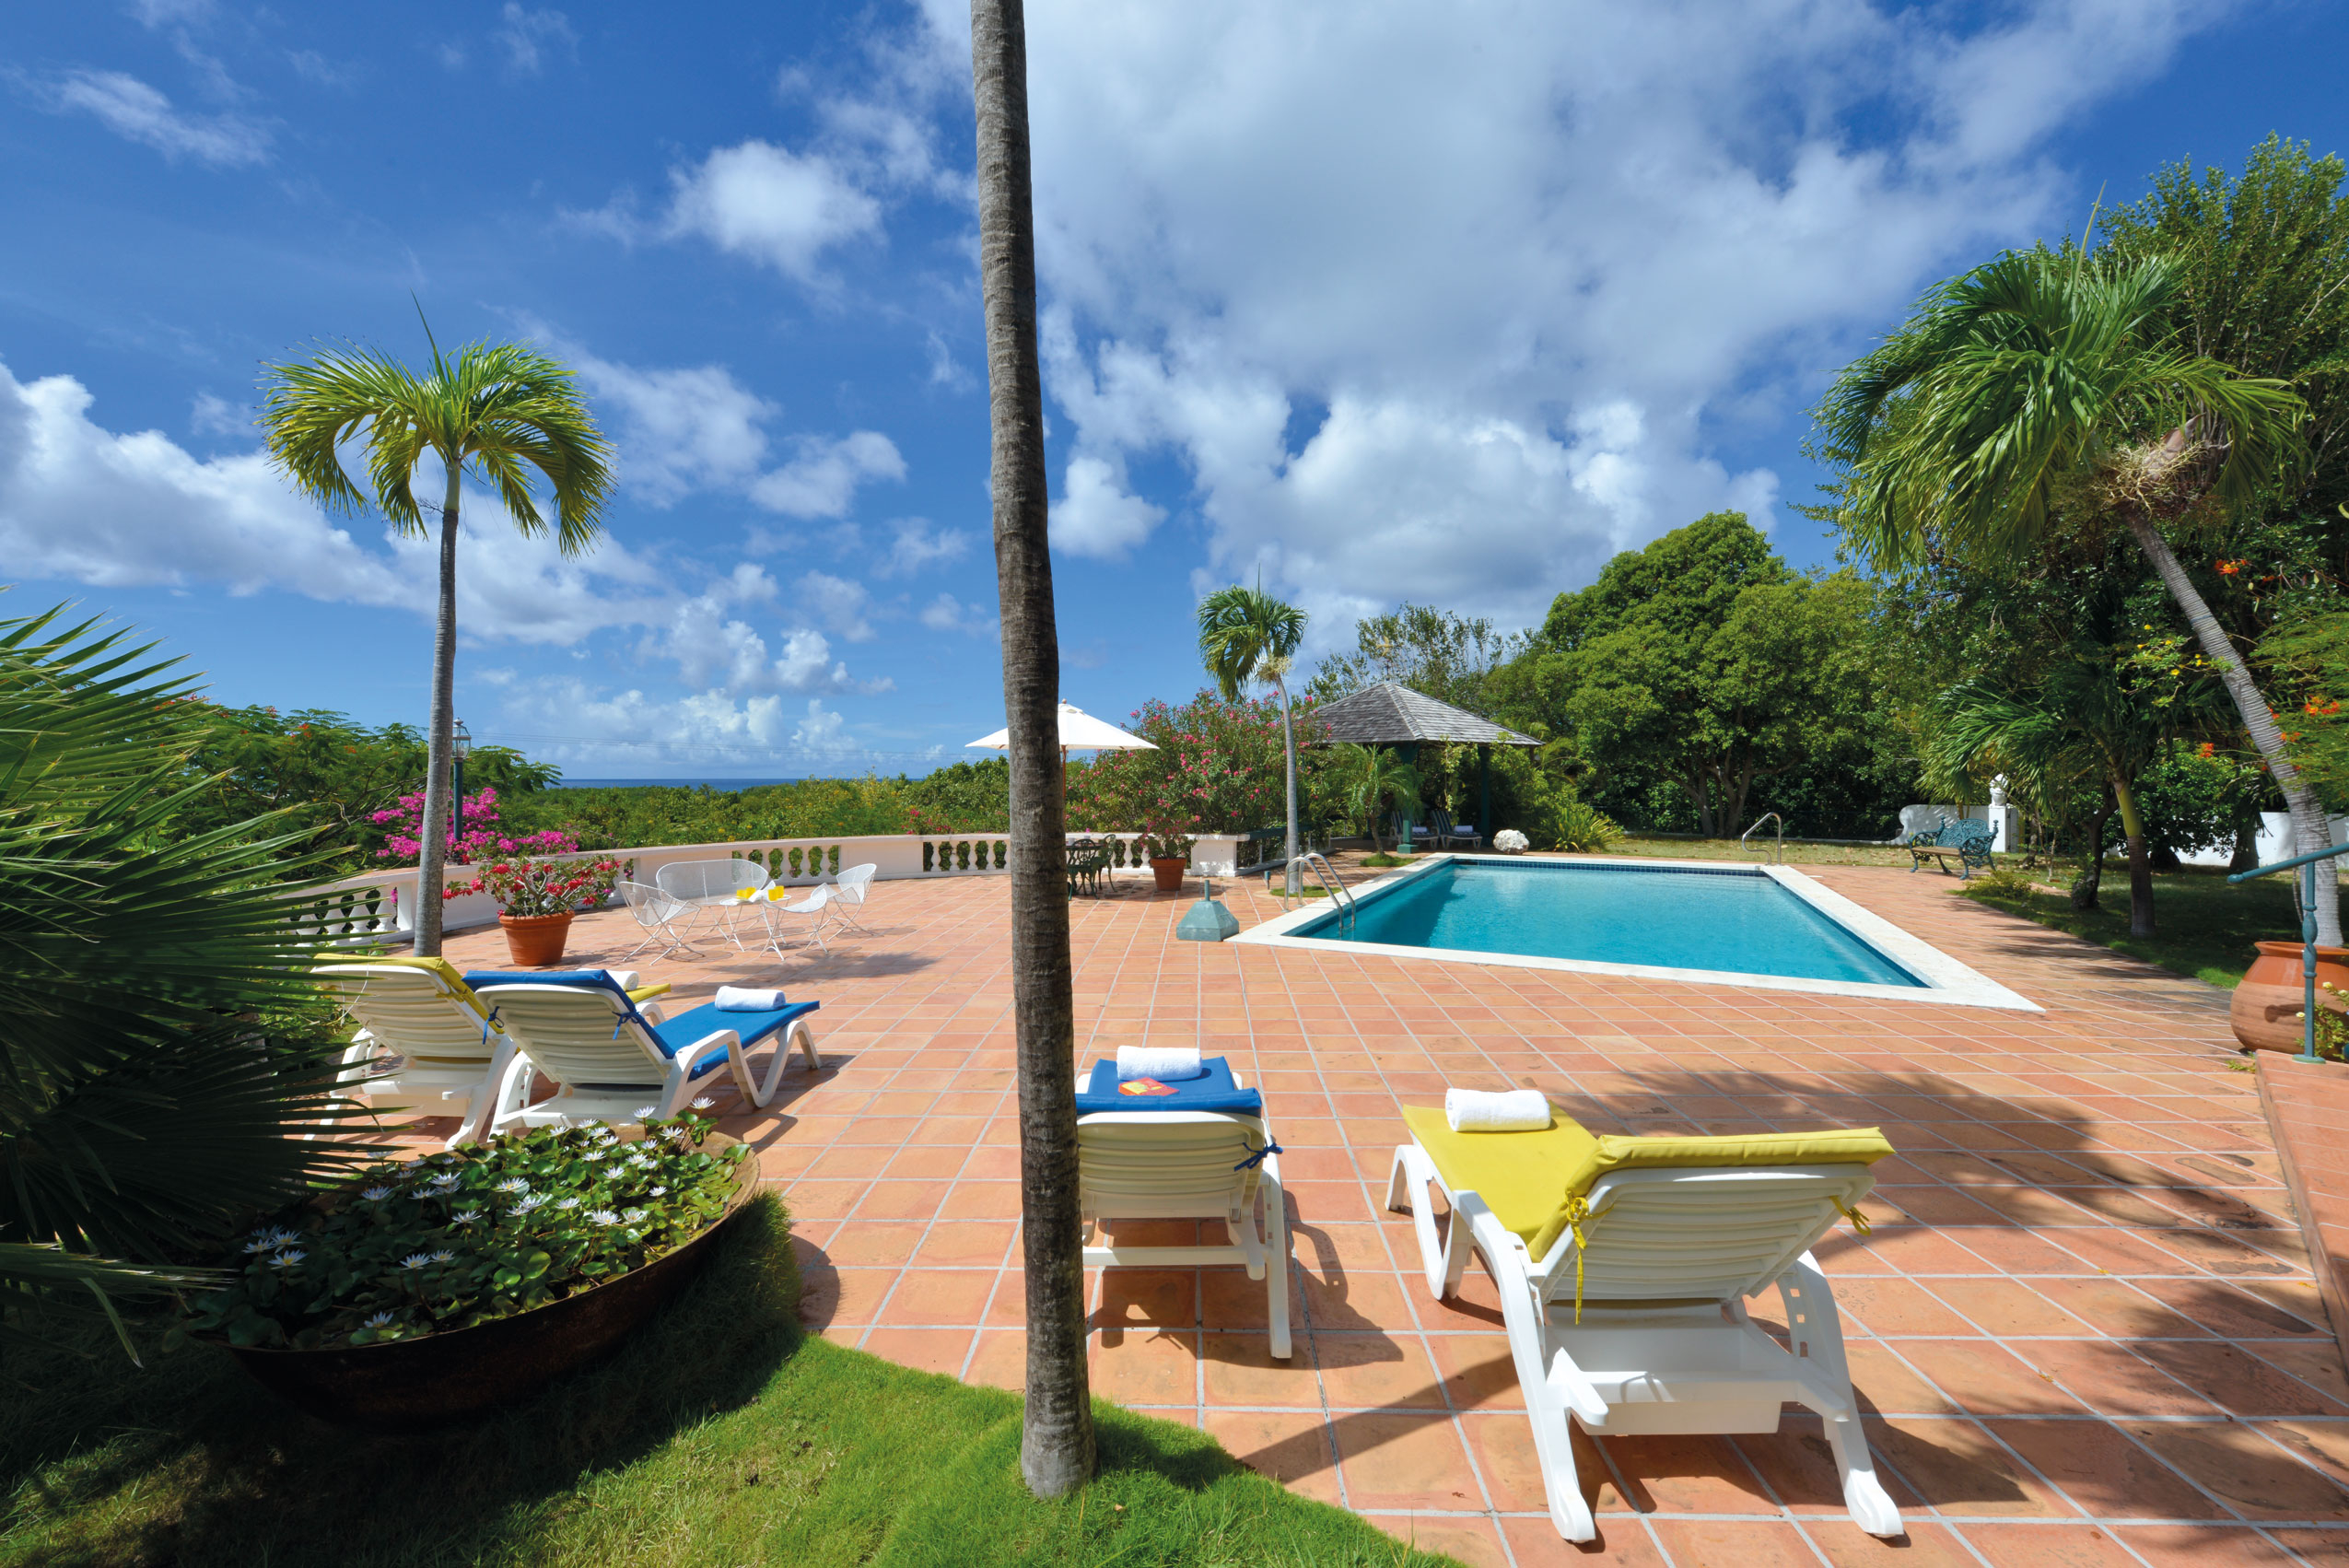 Luxury villa rentals caribbean - St martin - Saint martin french - Les terres basses - Les Zephyrs - Image 1/14